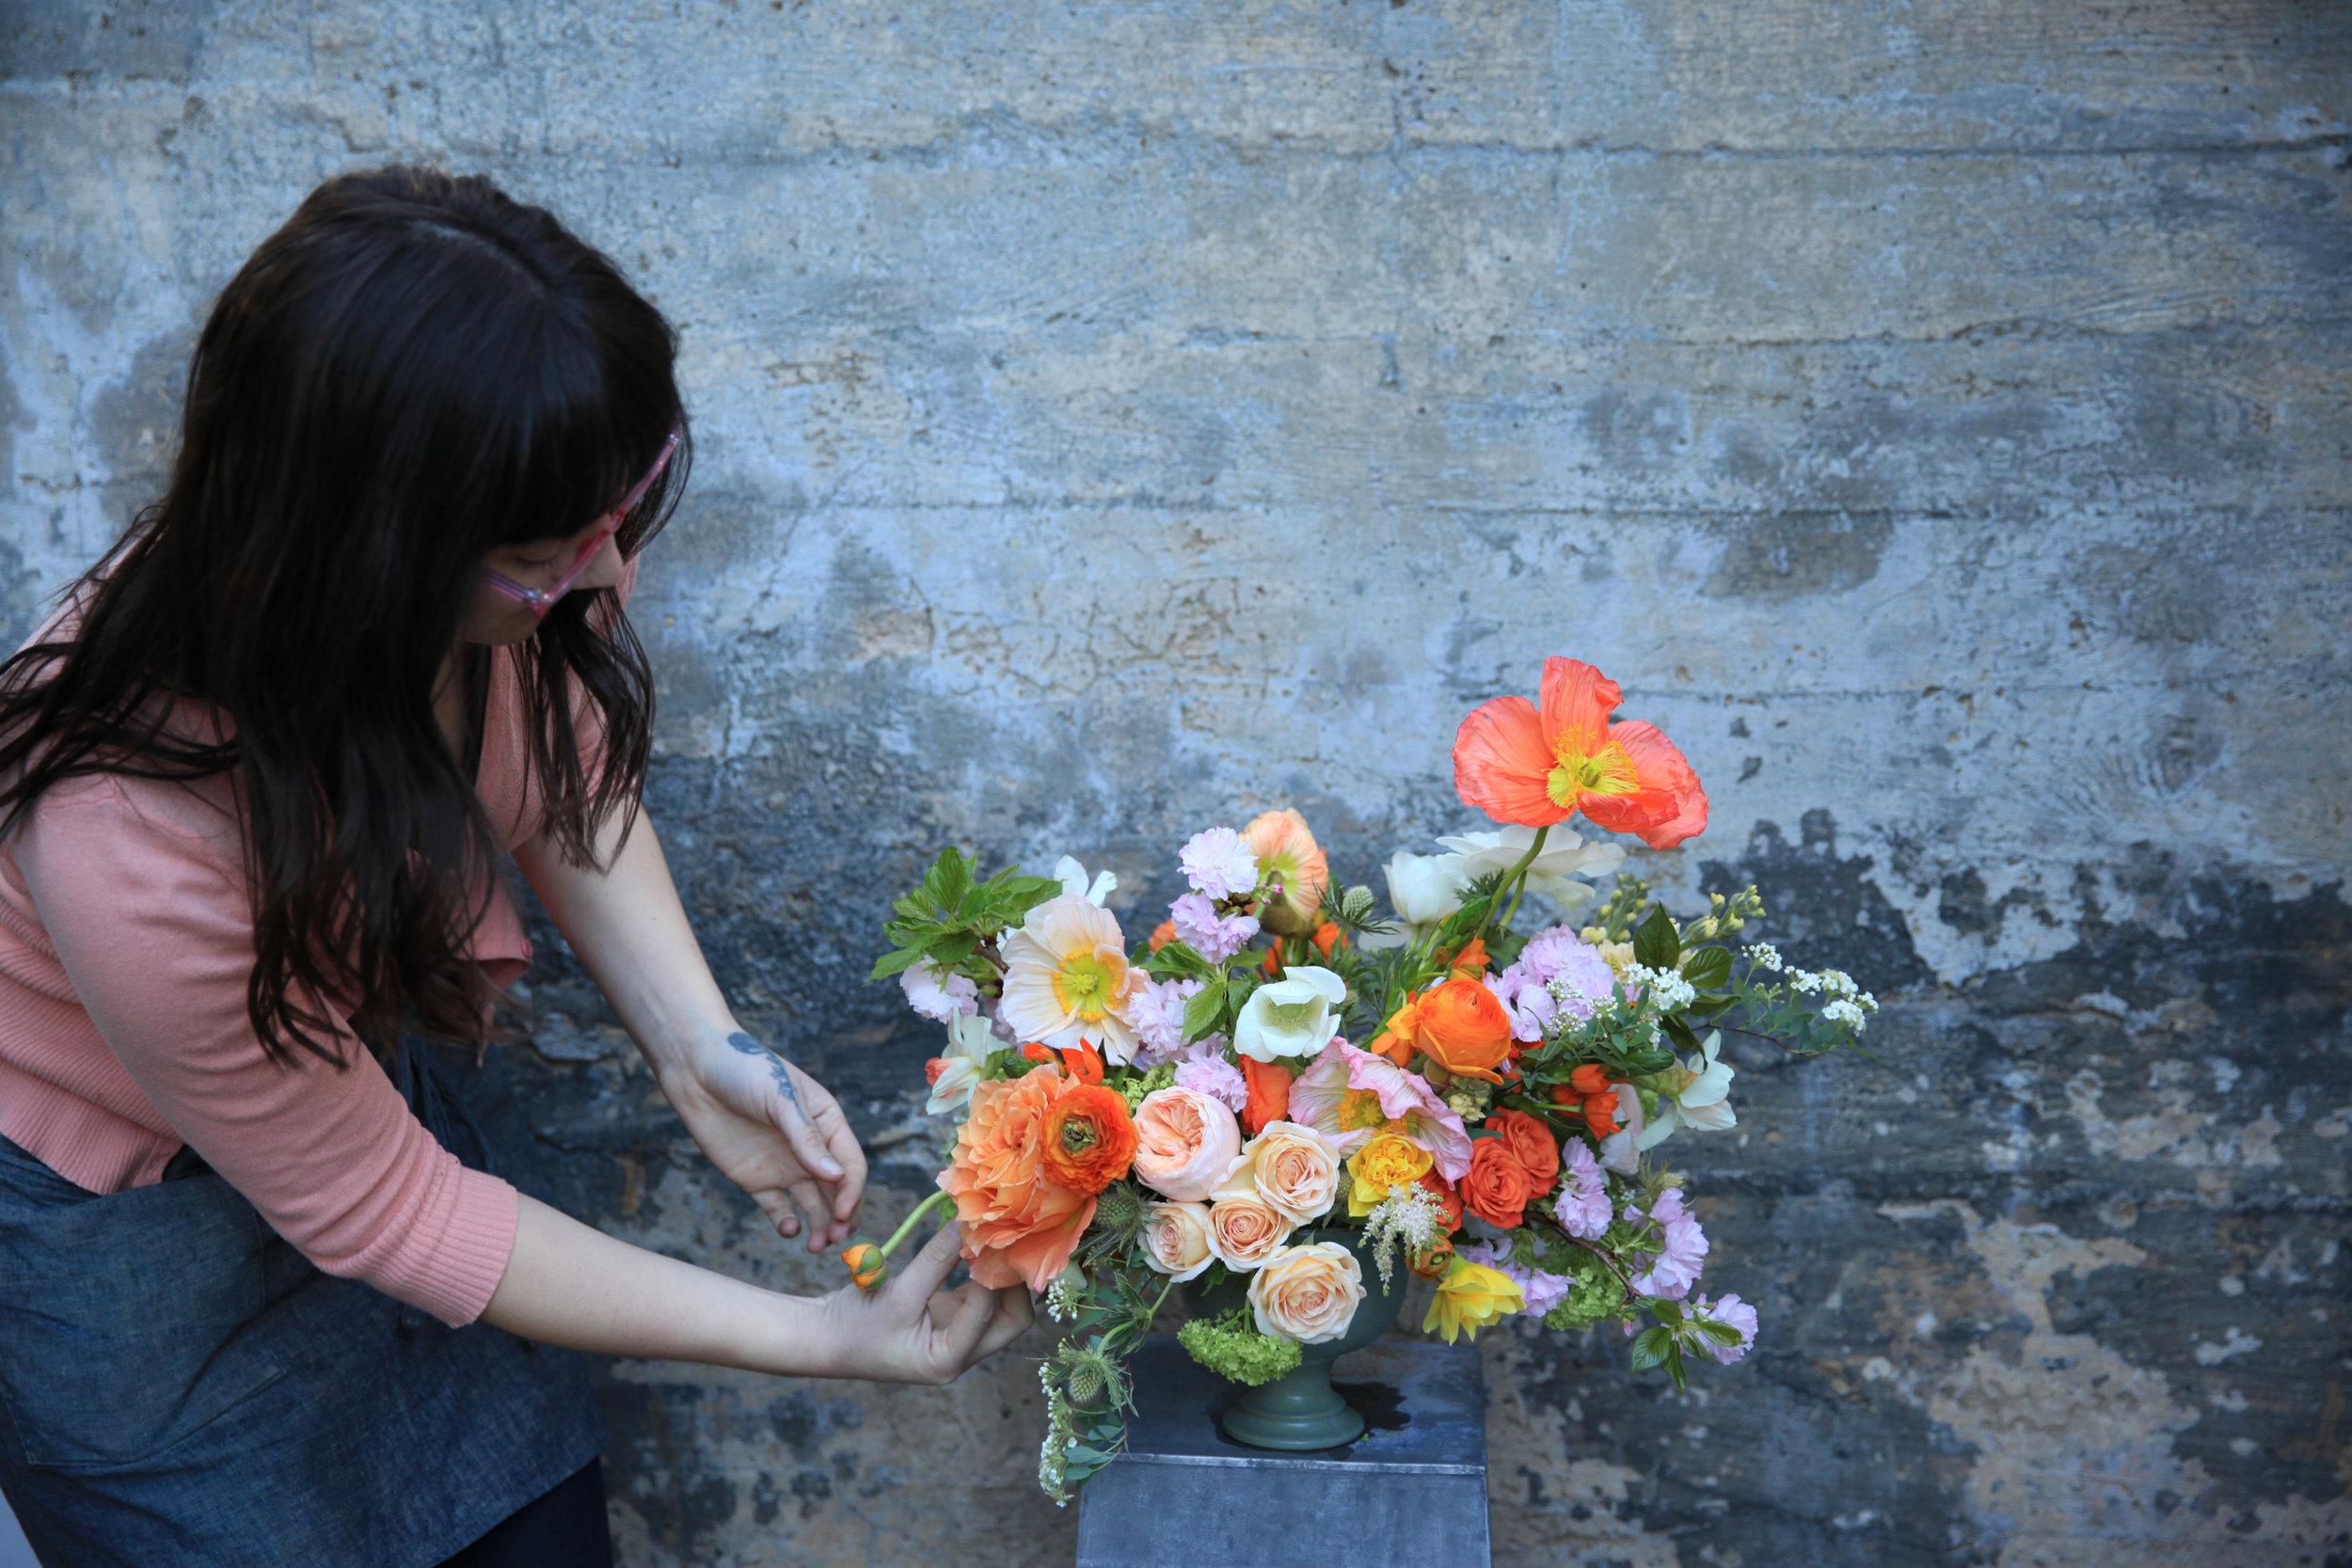 caitlin with poppy arrangement.jpg